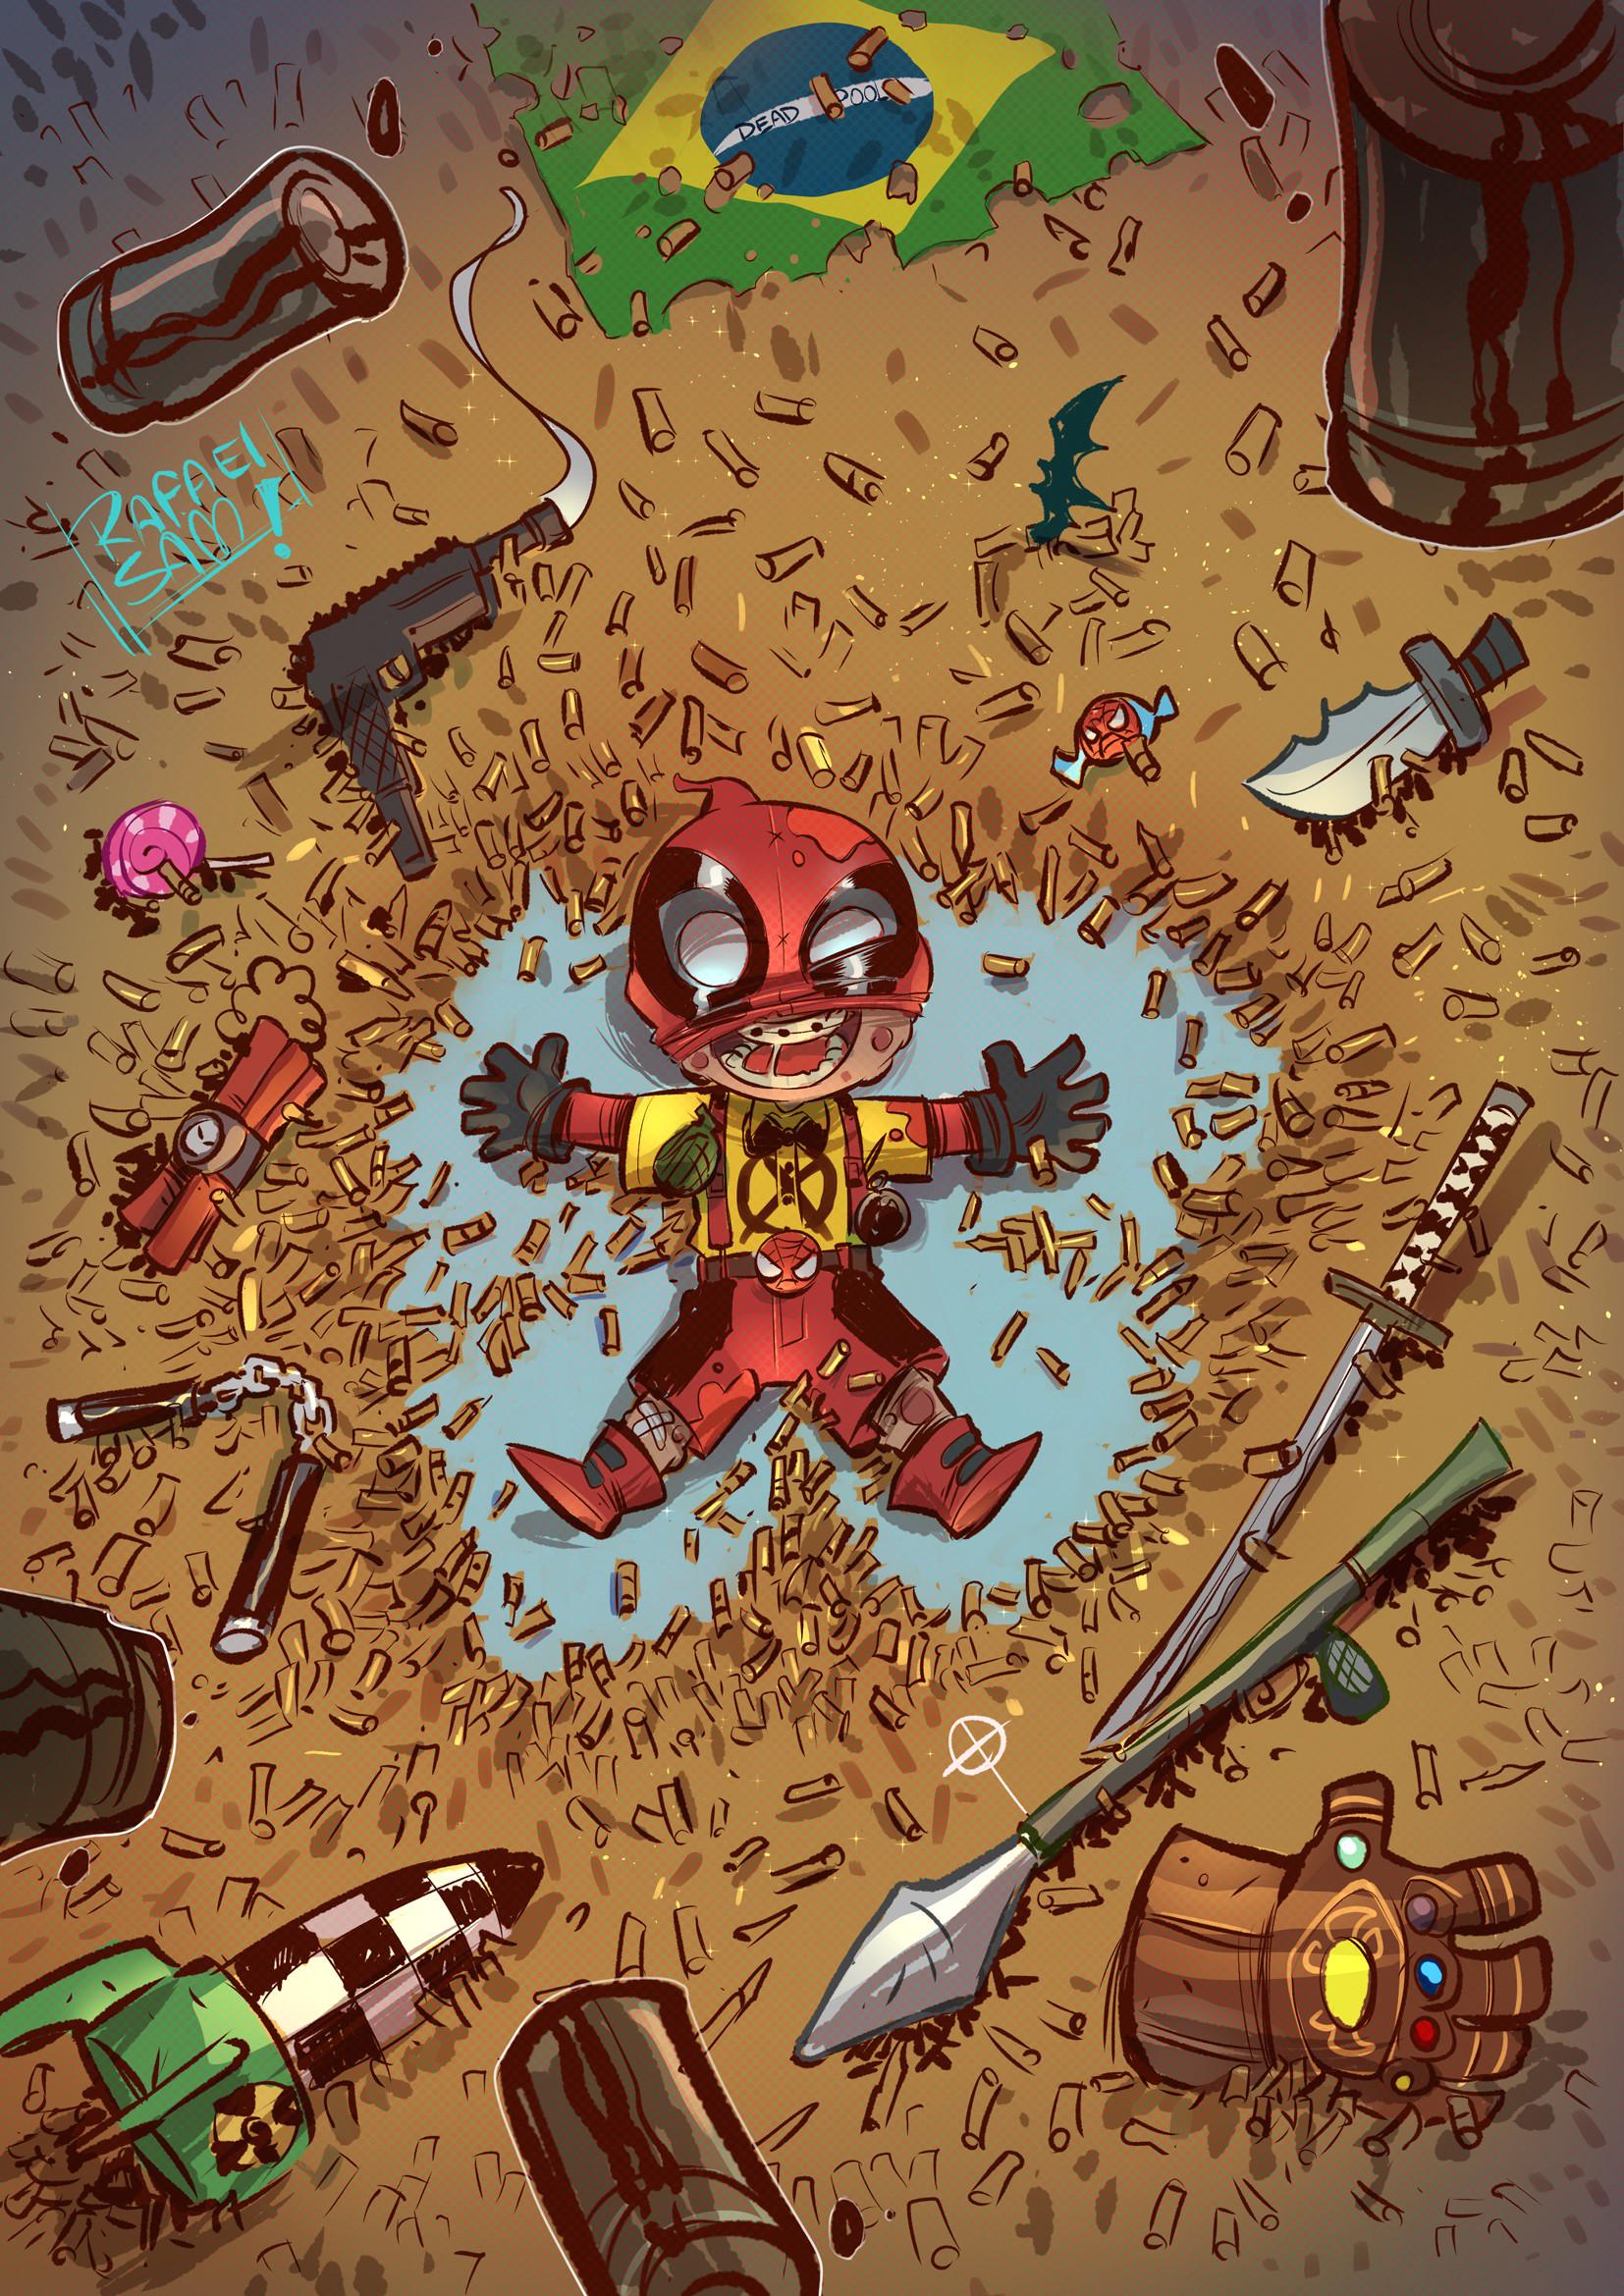 Rafael Sam Illustration Marvel Comics Deadpool Children Gun Rocket Launchers Gloves Bullet